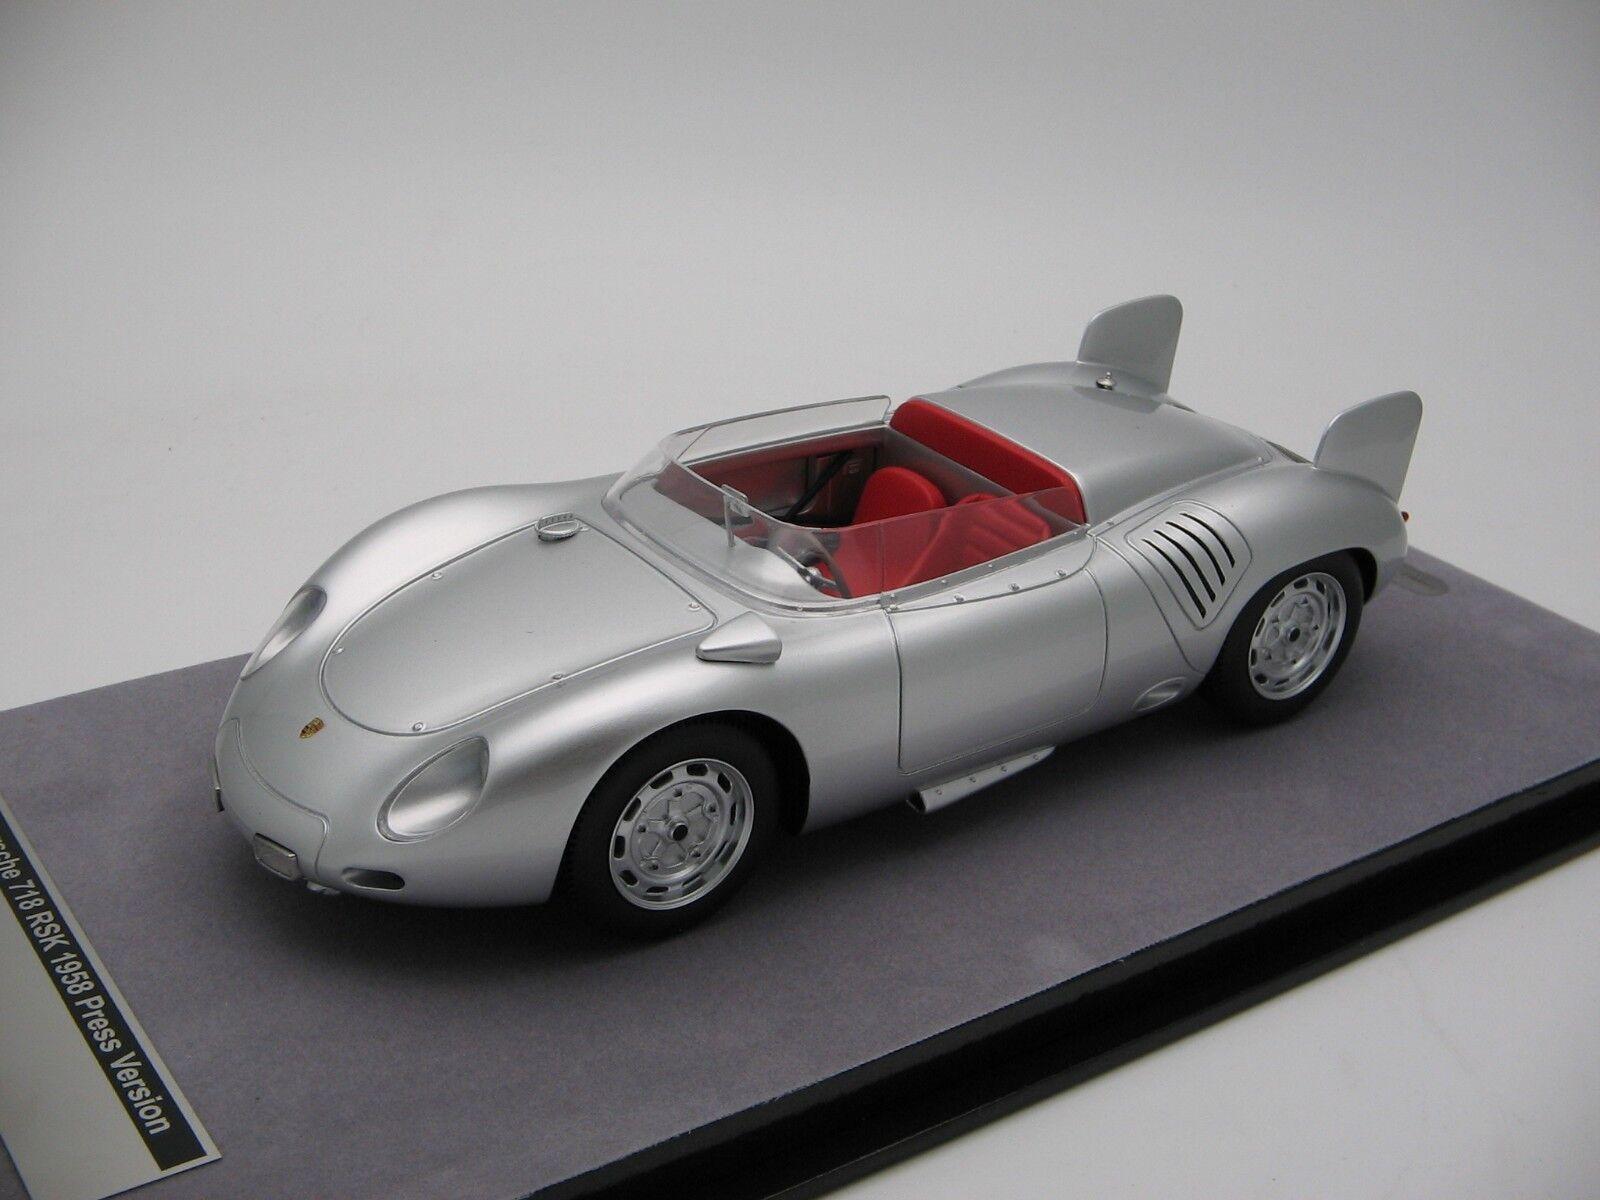 1 18 scale Tecnomodel Porsche 718 RSK Press Version 1958 - TM18-82E